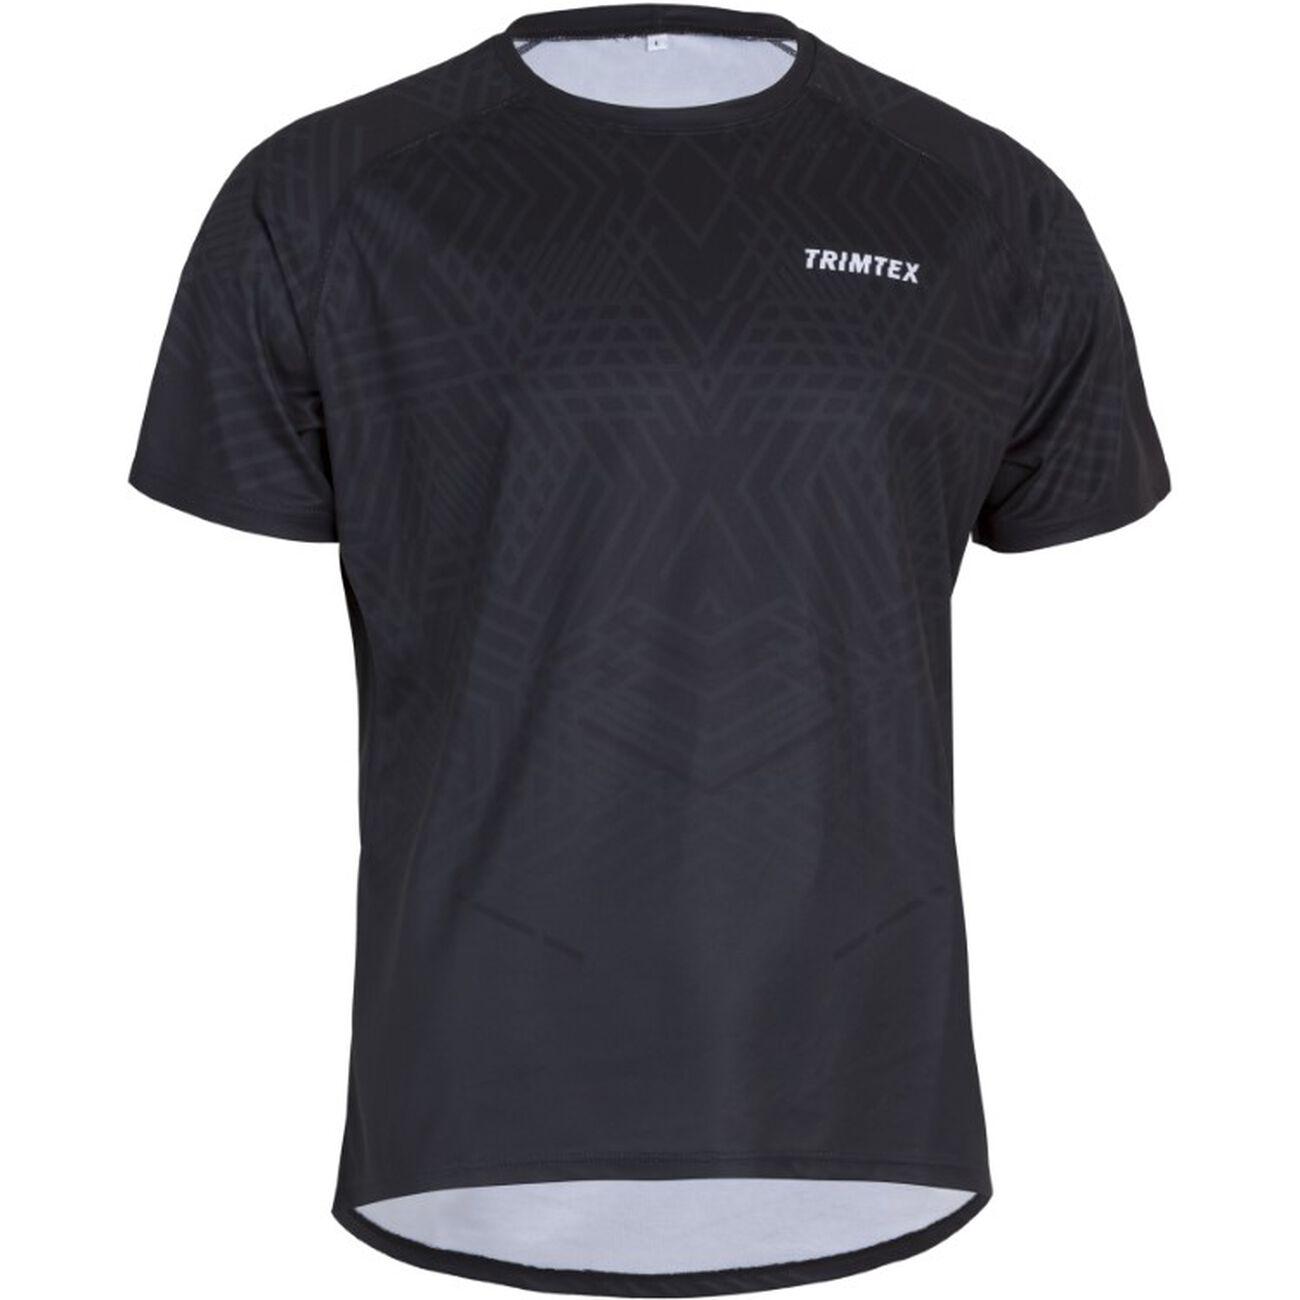 Free T-Shirt SS